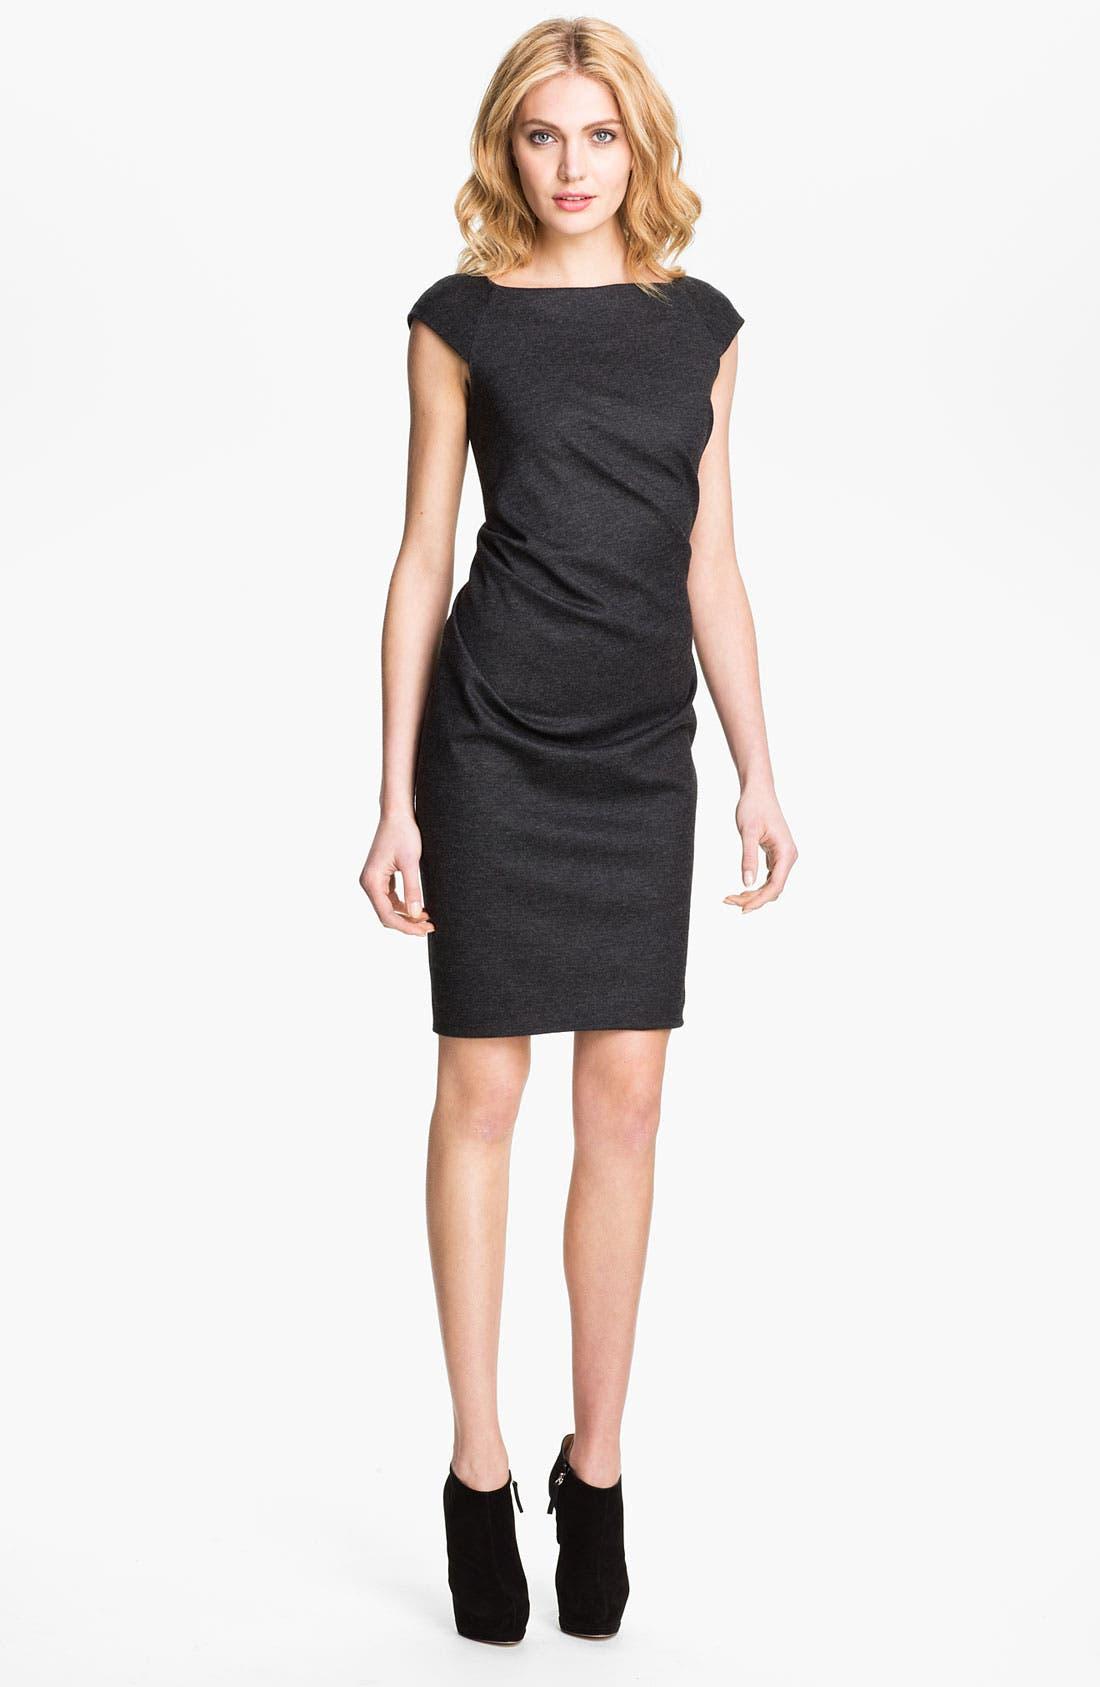 Alternate Image 1 Selected - Diane von Furstenberg Stretch Wool Jersey Shift Dress